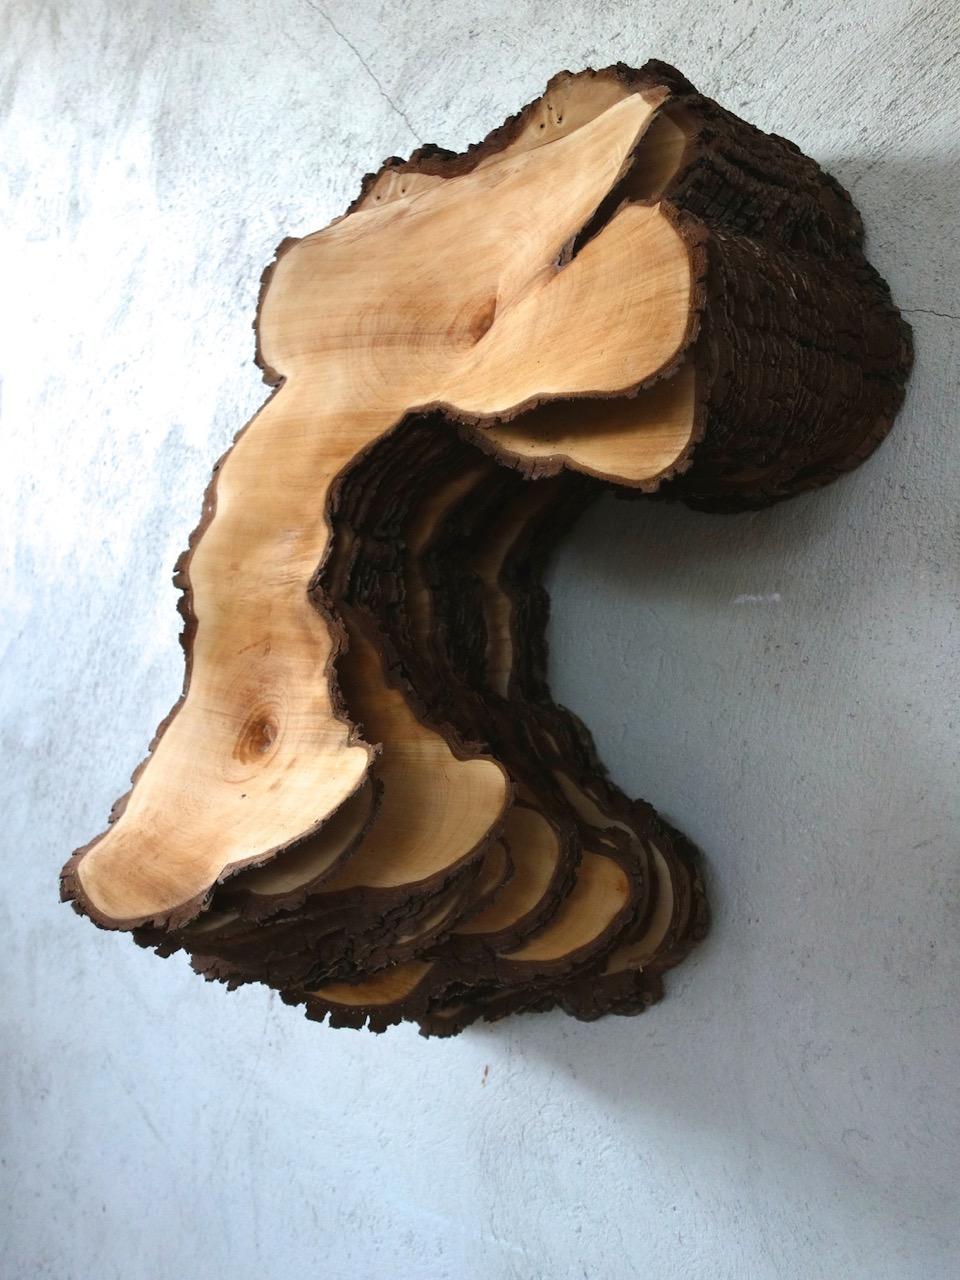 06_Herbert Golser, Untitled, 2014, pear wood, 63x60x103cm